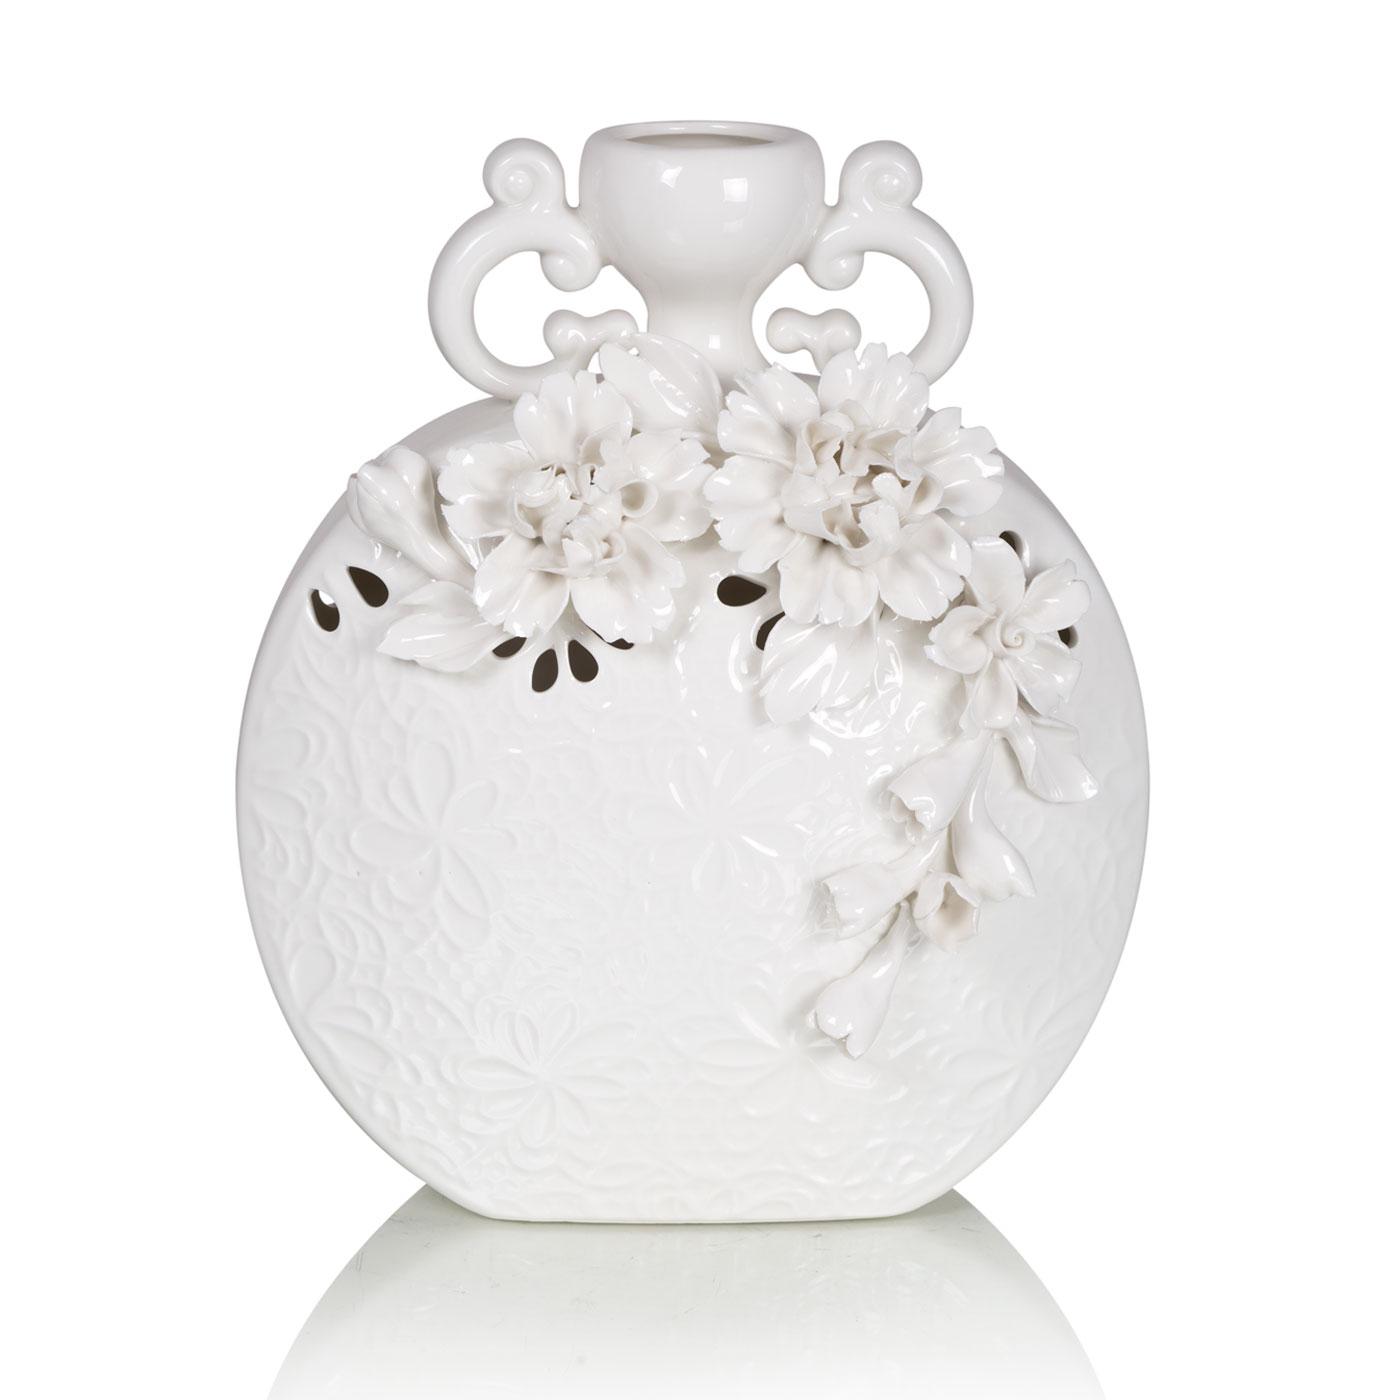 Купить Вазы Home Philosophy, Ваза Camilla Цвет: Белый (21х10х25 см), Китай, Керамика